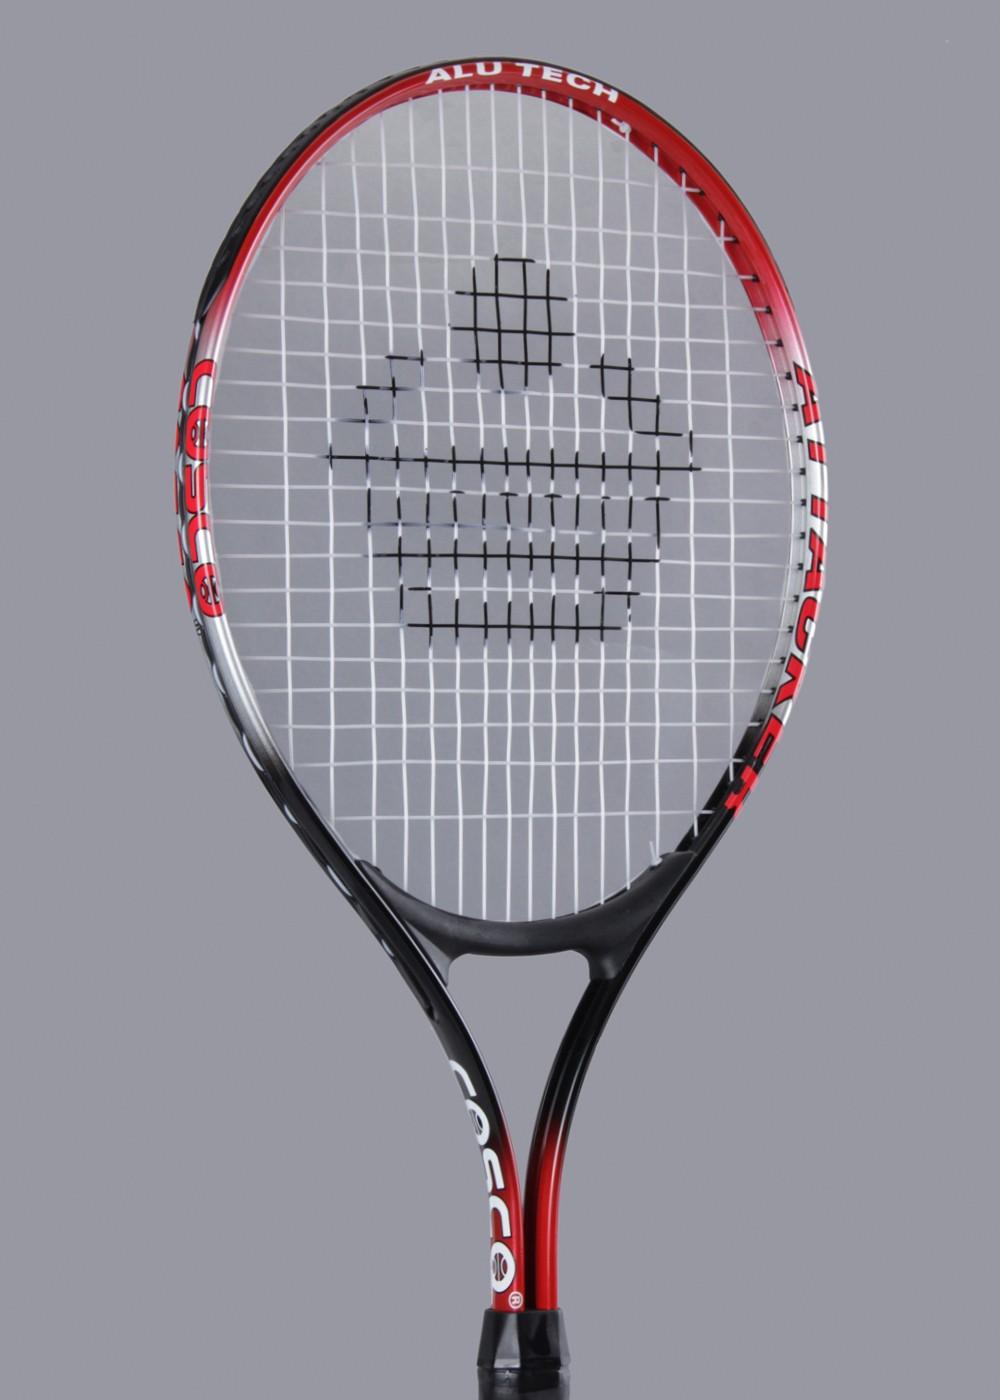 Cosco Attacker Tennis Racket